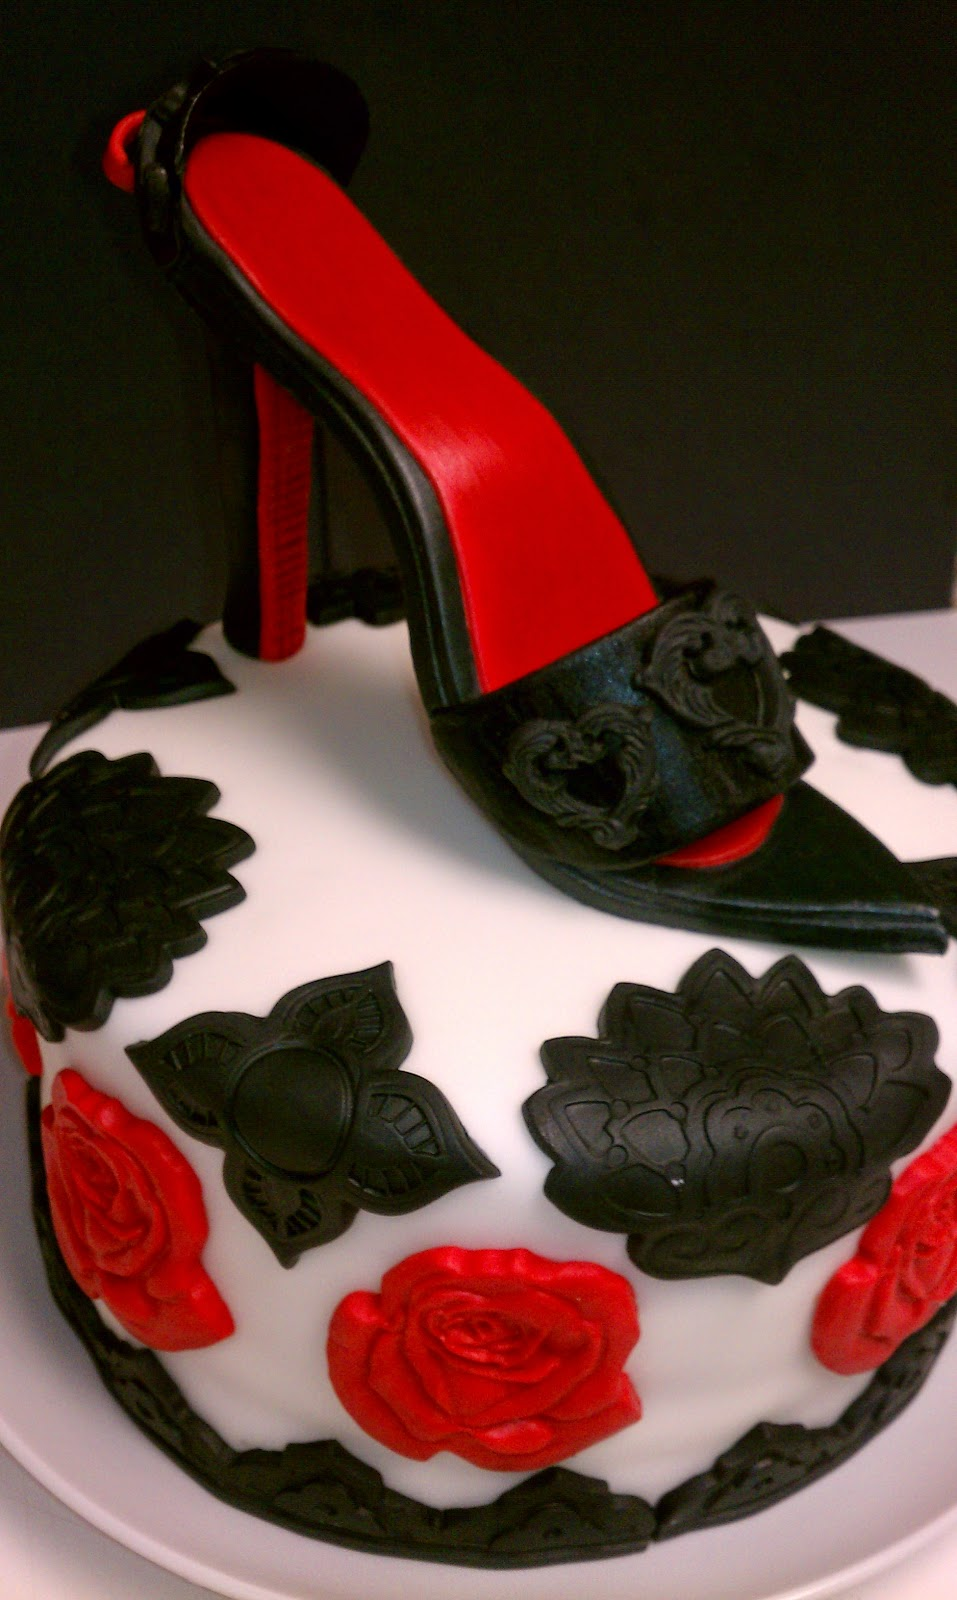 The Birthday Cake Beautiful Shoe To A Dear Miscellaneous Garden